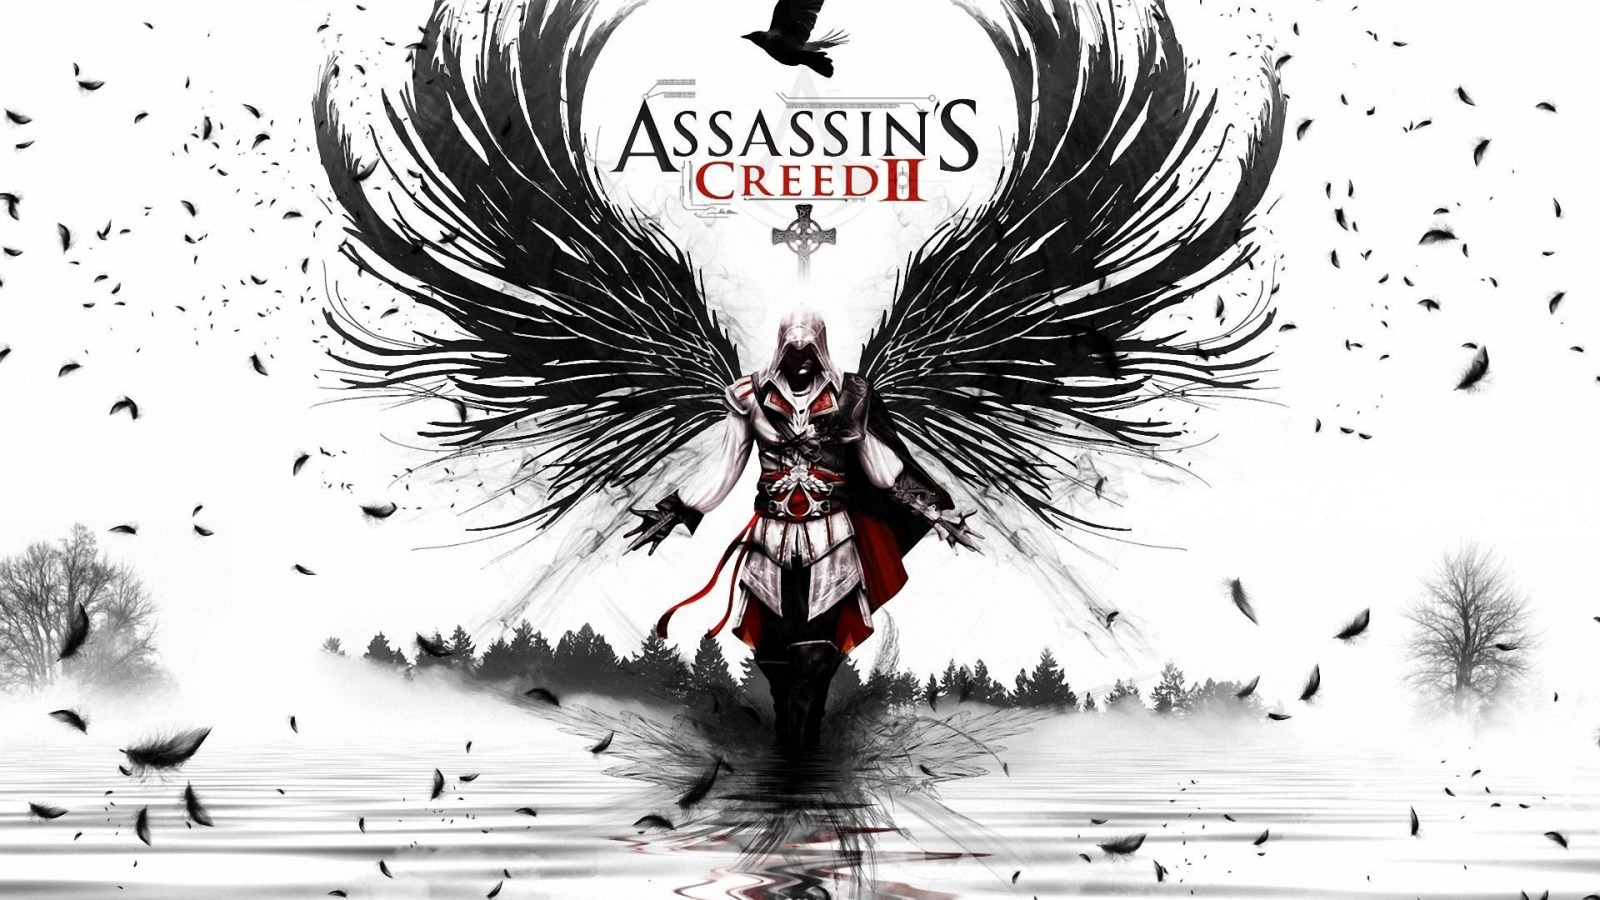 Art - Assassin's Creed 2 Арт